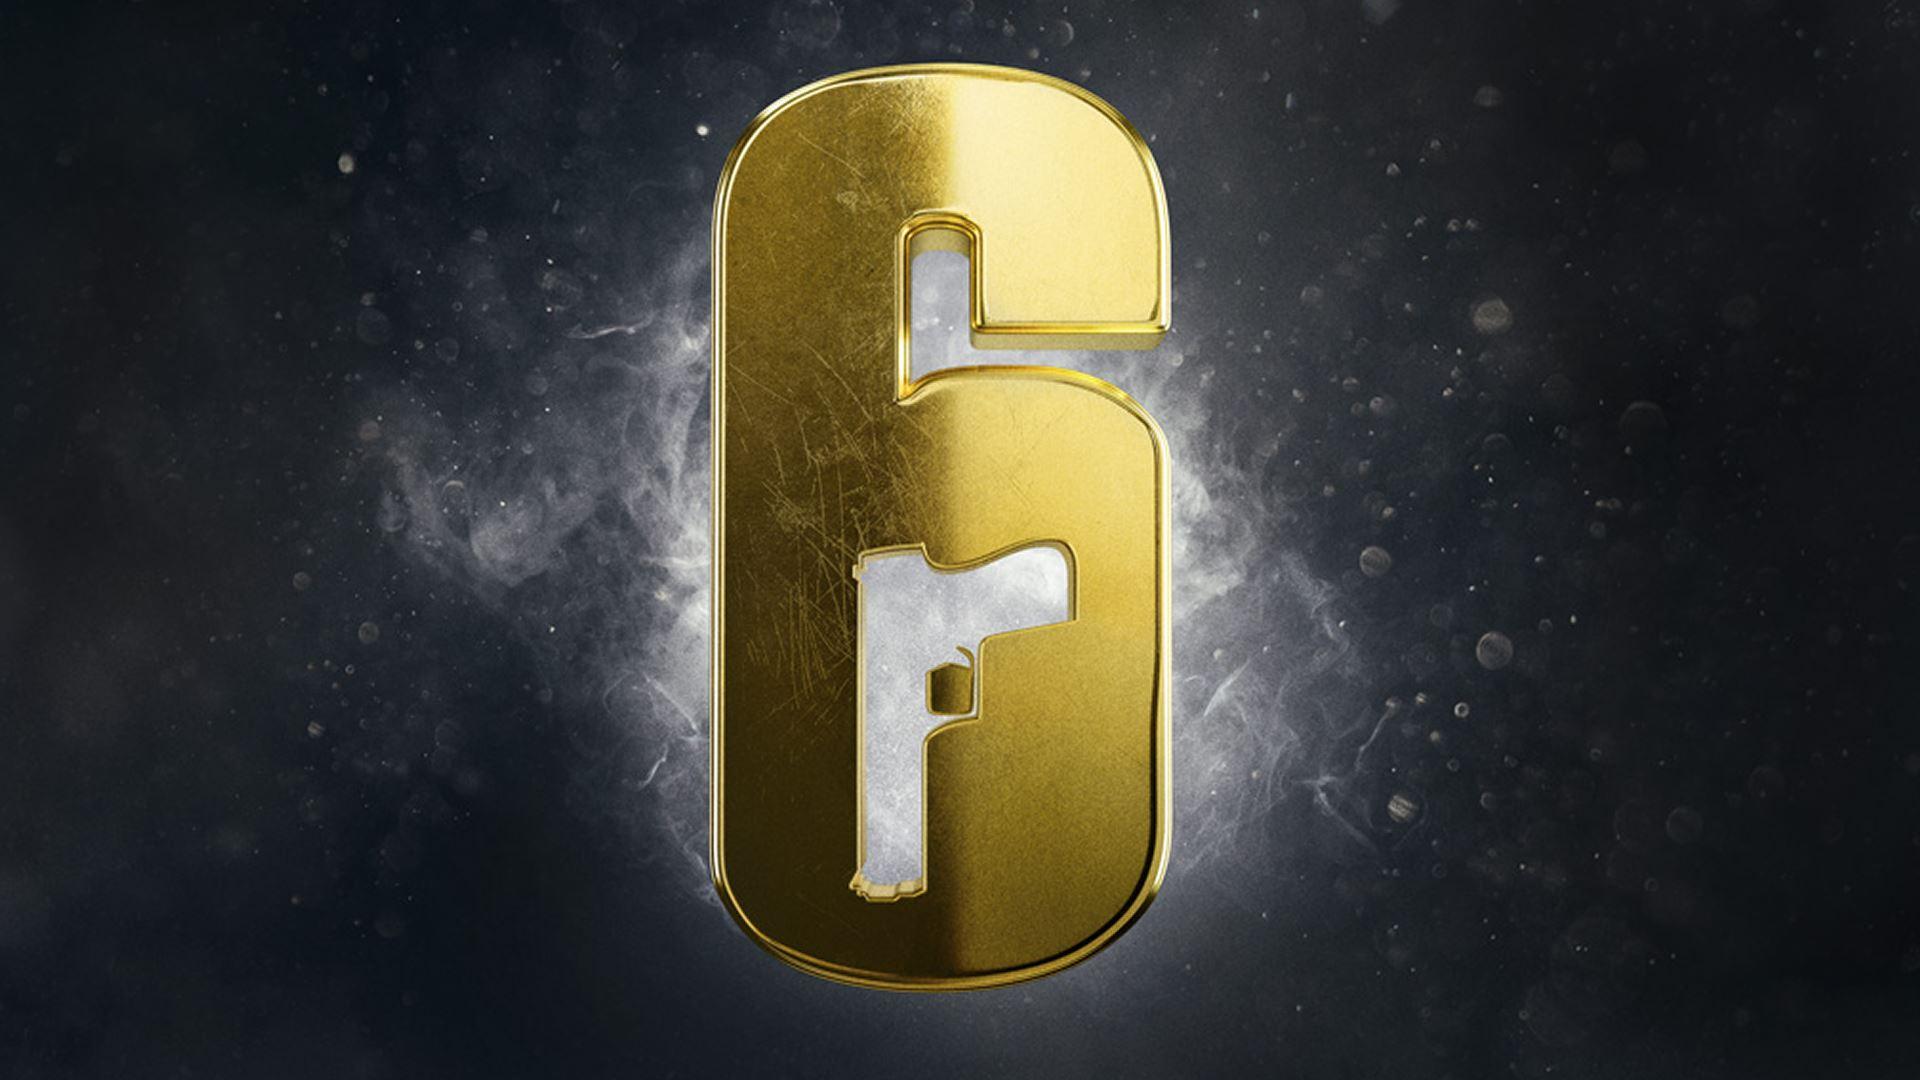 Rainbow Six Siege Logos